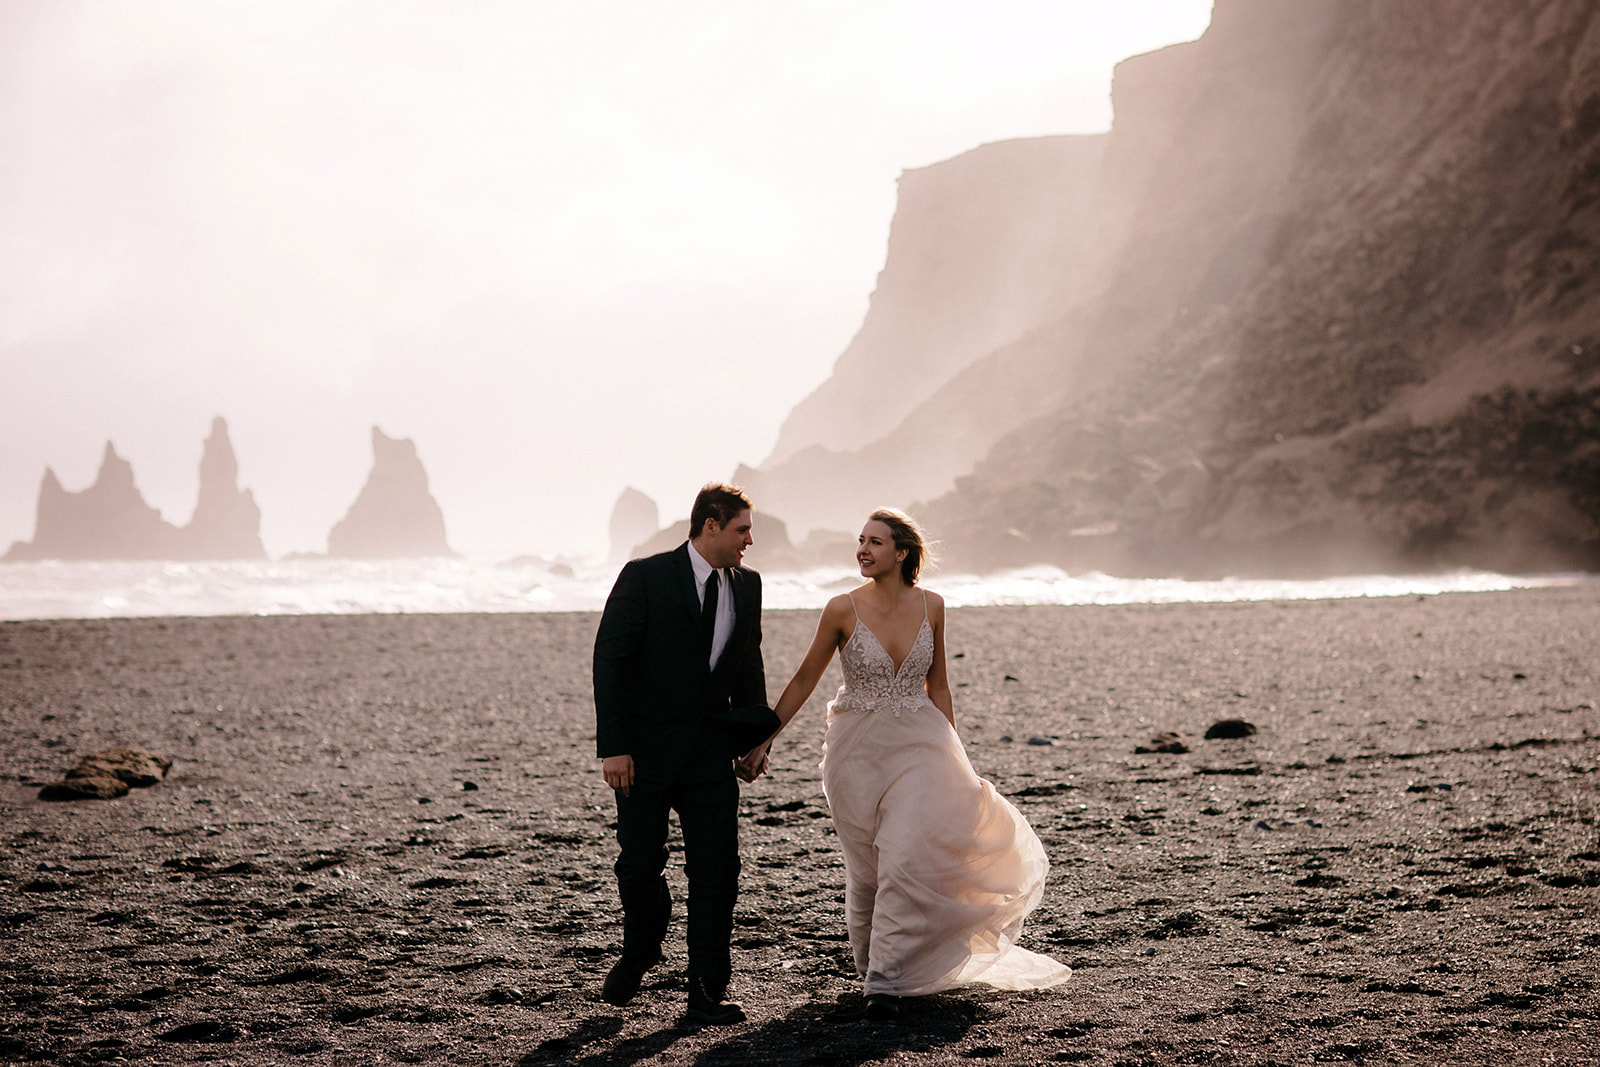 Icelandic Iceland Elopement Wedding Elope Photographer Eloping Reykjavík Vik Black Sand Beach Jökulsárlón Skogafoss Waterfall Vestrahorn Mountain Liz Osban Photography Destination 73.jpg